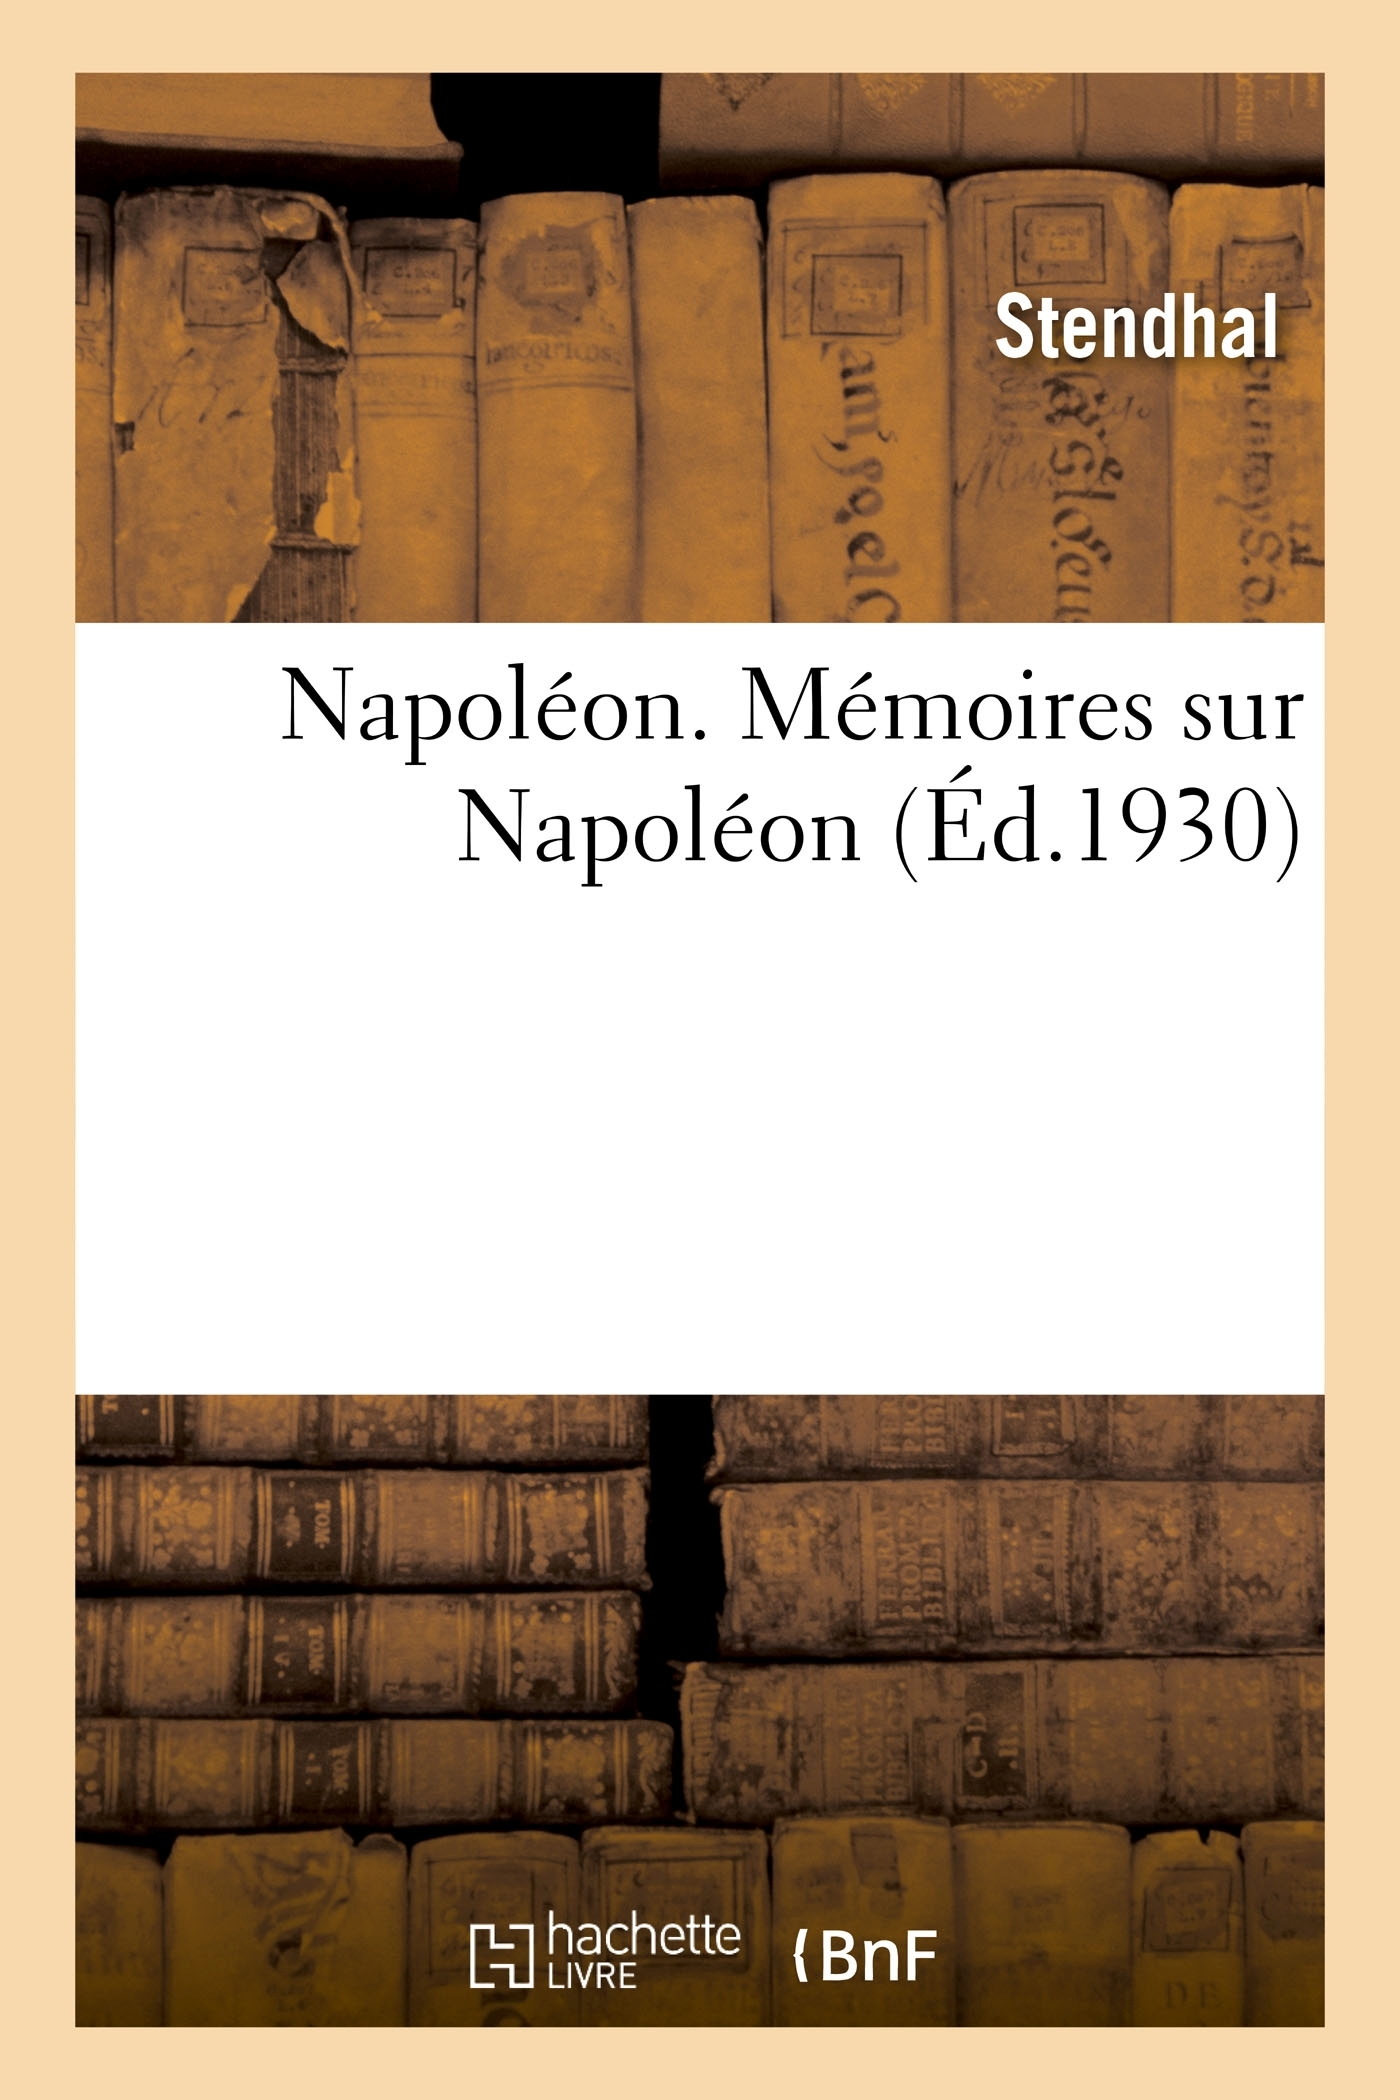 NAPOLEON. MEMOIRES SUR NAPOLEON